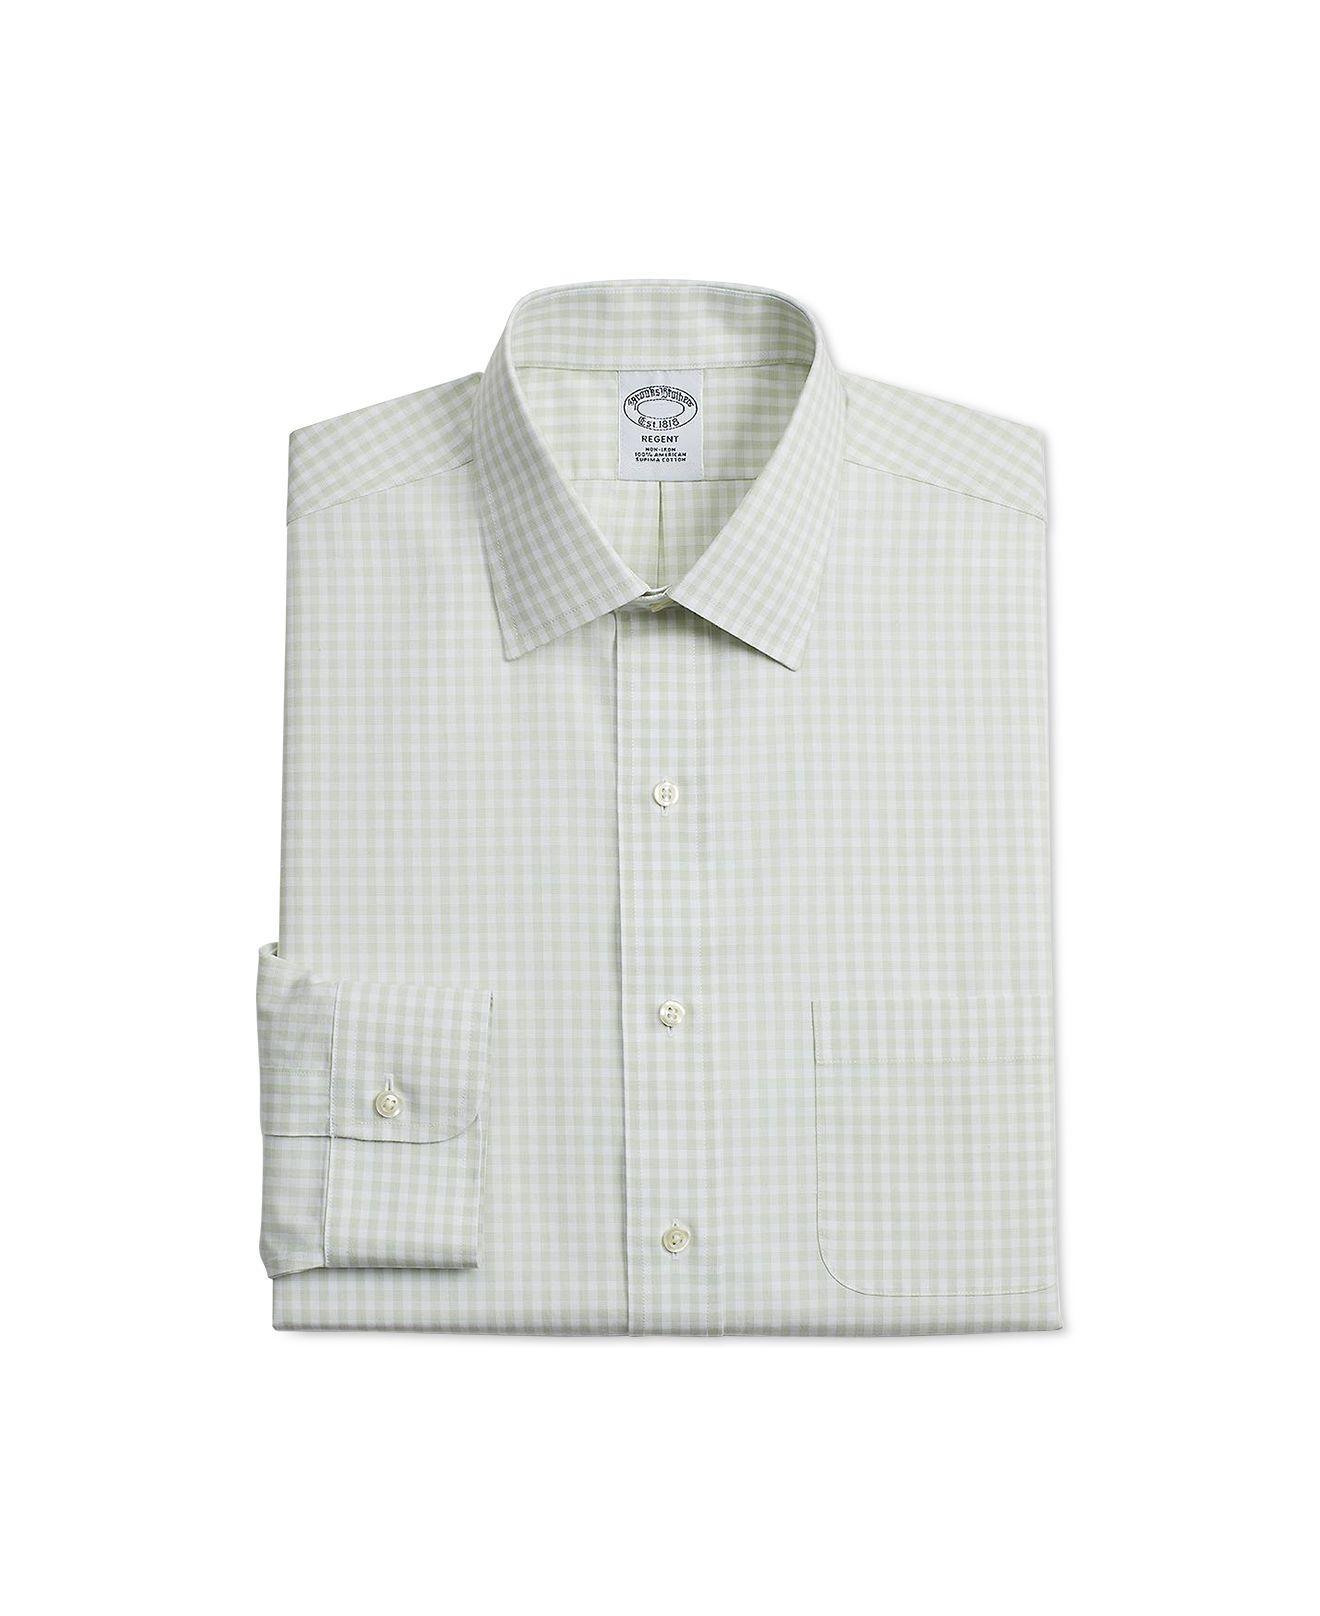 8e4a6e3a516 Brooks Brothers. Men's Regent Slim-fit Non-iron Green Gingham Supima Cotton Dress  Shirt